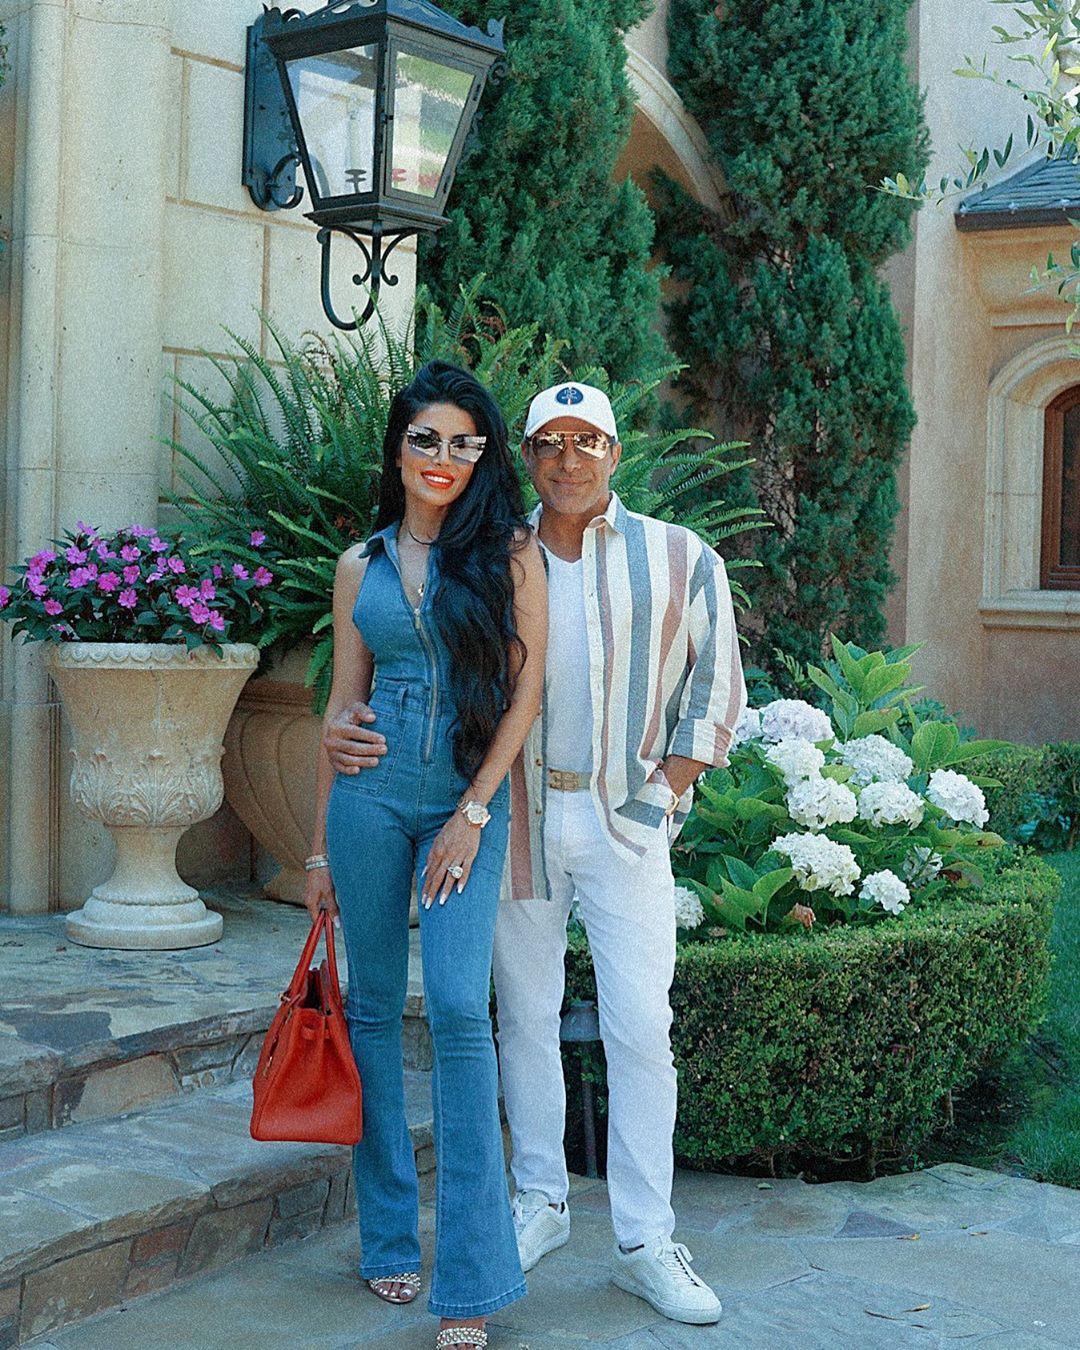 Manny Khoshbin and partner on Instagram